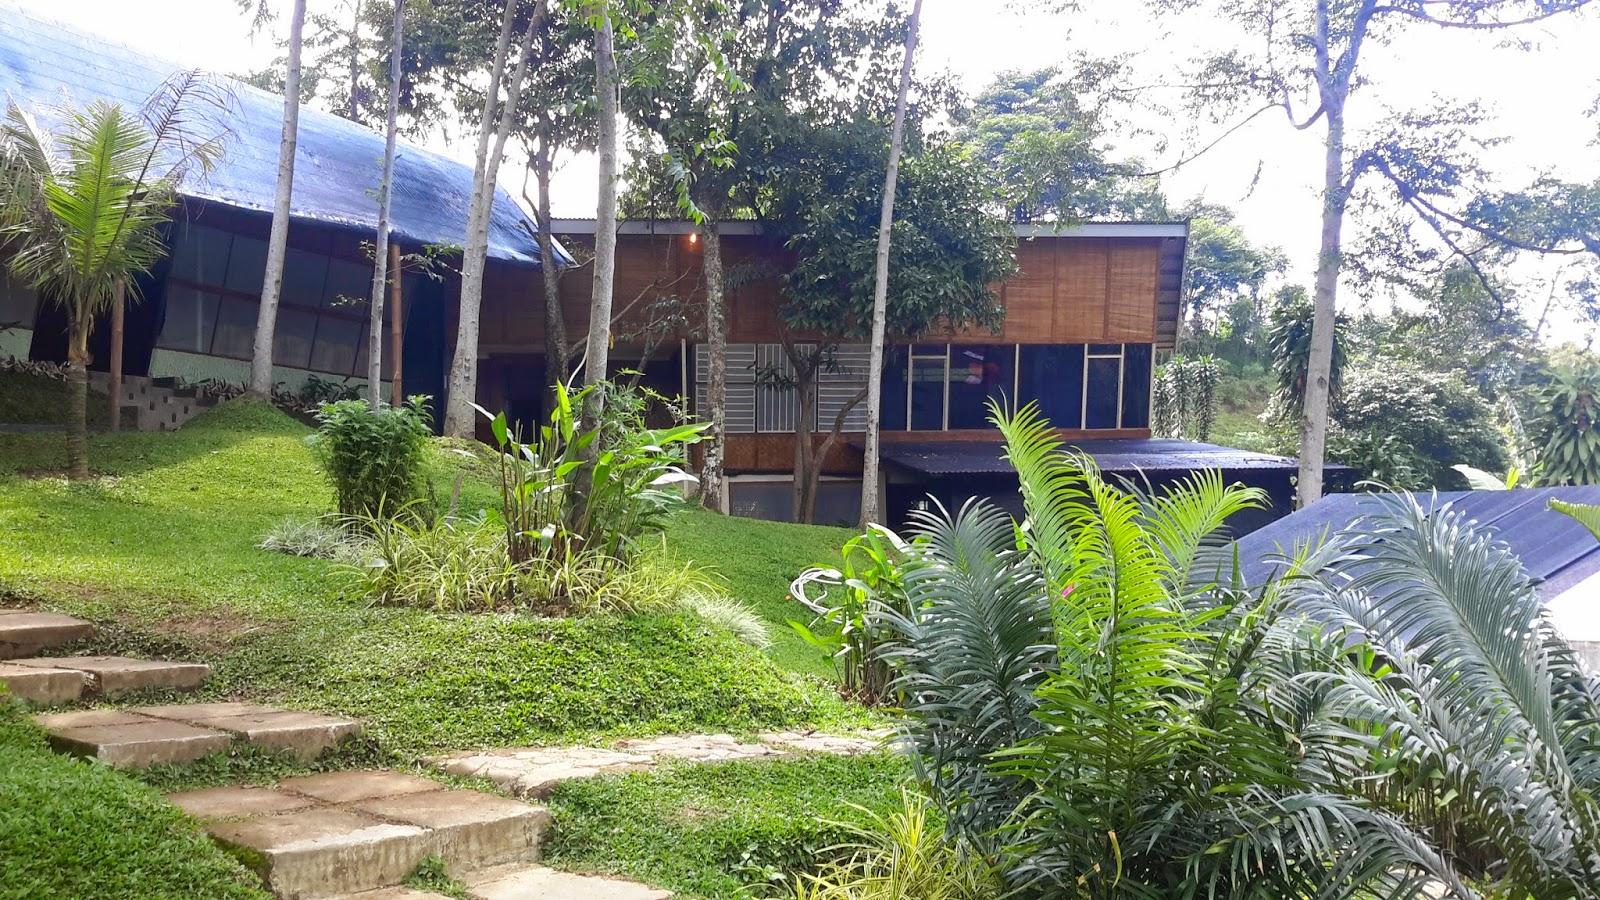 Wisata Alam Camping Sentul